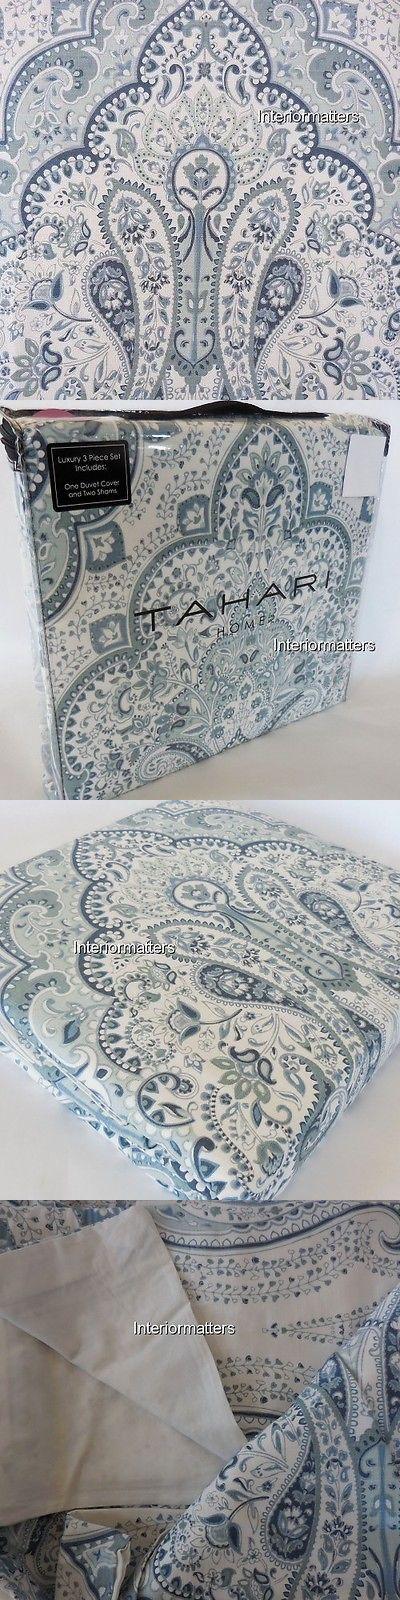 Duvet Covers and Sets 37644: Tahari Medallion 3Pc Full Queen Duvet Cover Set Blue Ivory 300Tc New -> BUY IT NOW ONLY: $98 on eBay!